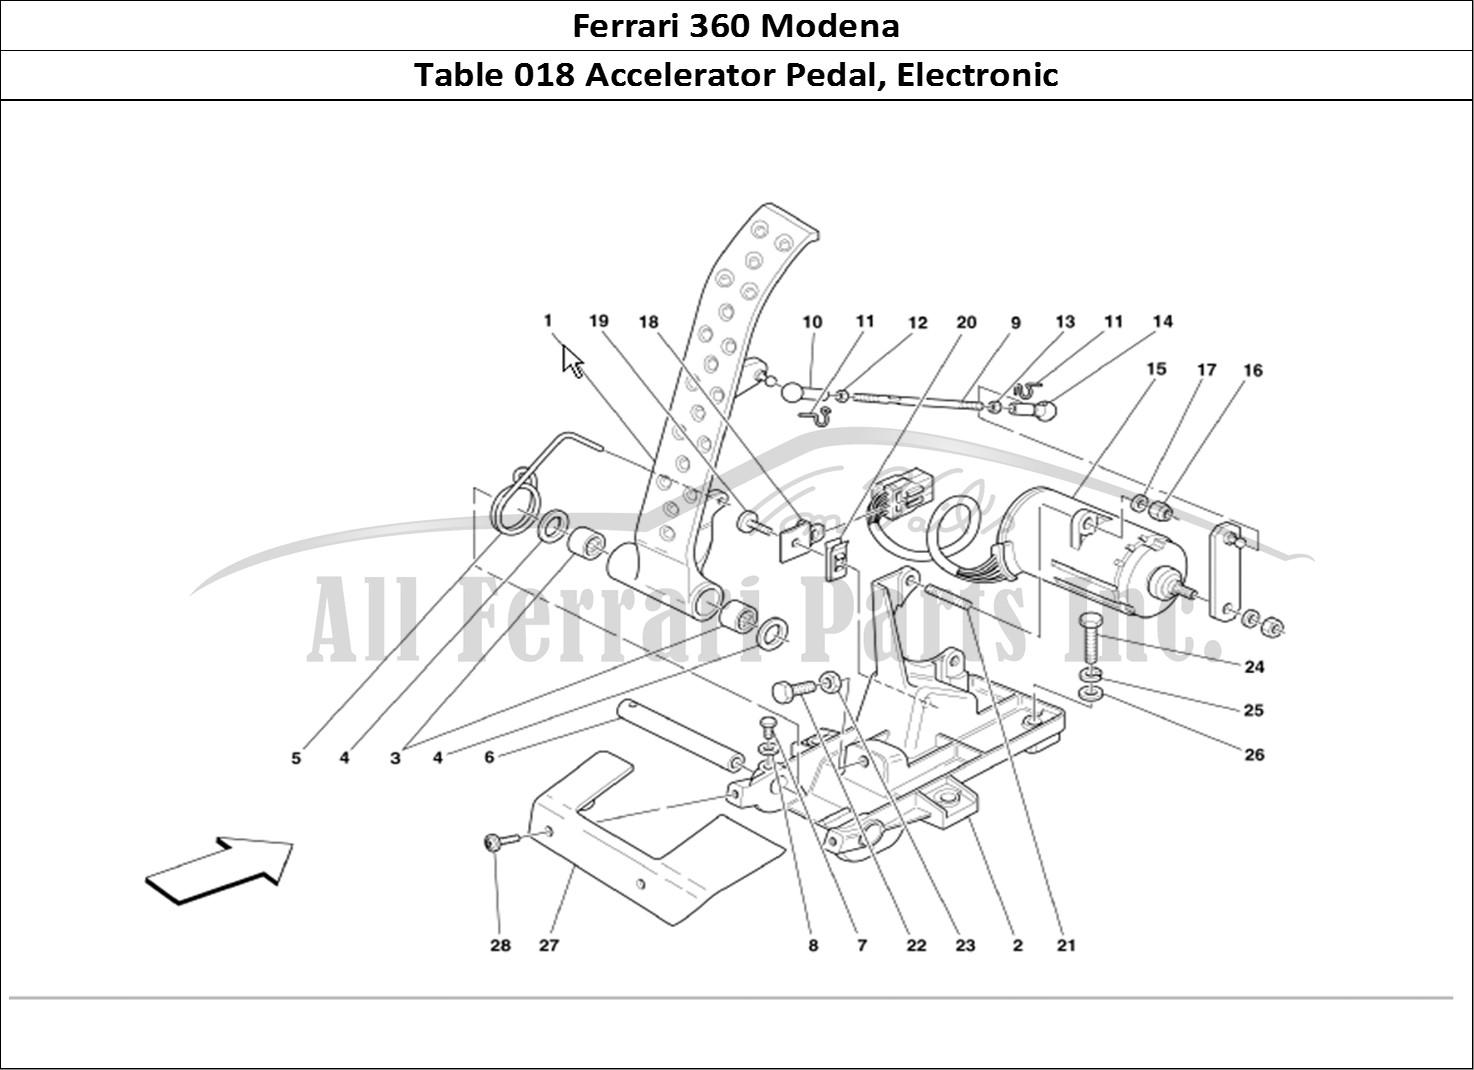 buy original ferrari 360 modena 018 accelerator pedal